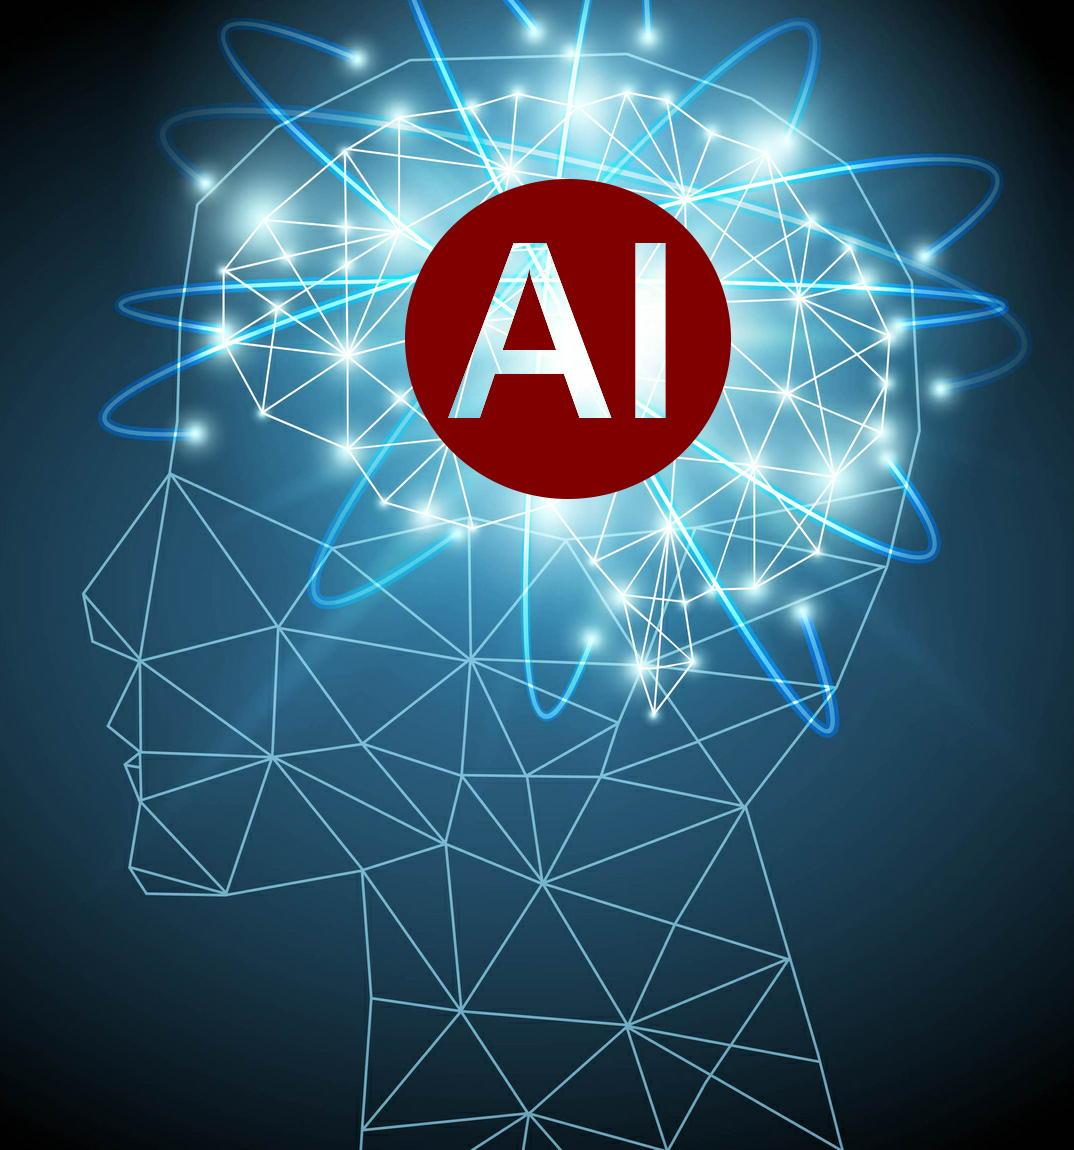 AI(人工知能)が自治体の保健指導を提案 医療費減へ 筑波大など共同開発